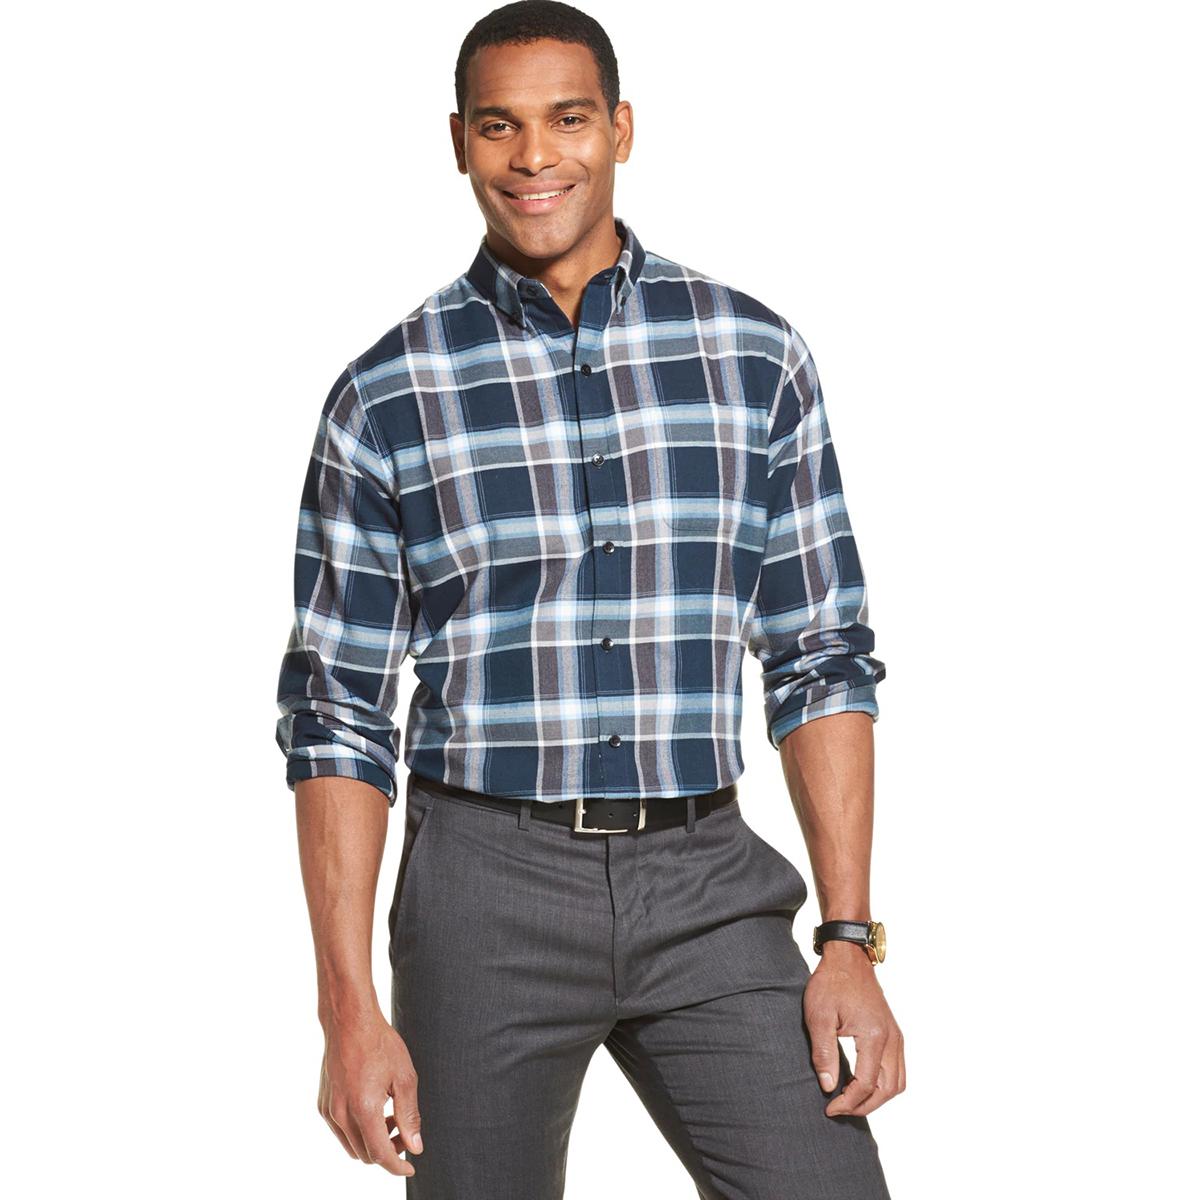 Van Heusen Men's Long-Sleeve Non Iron Plaid Button Down Shirt - Blue, M